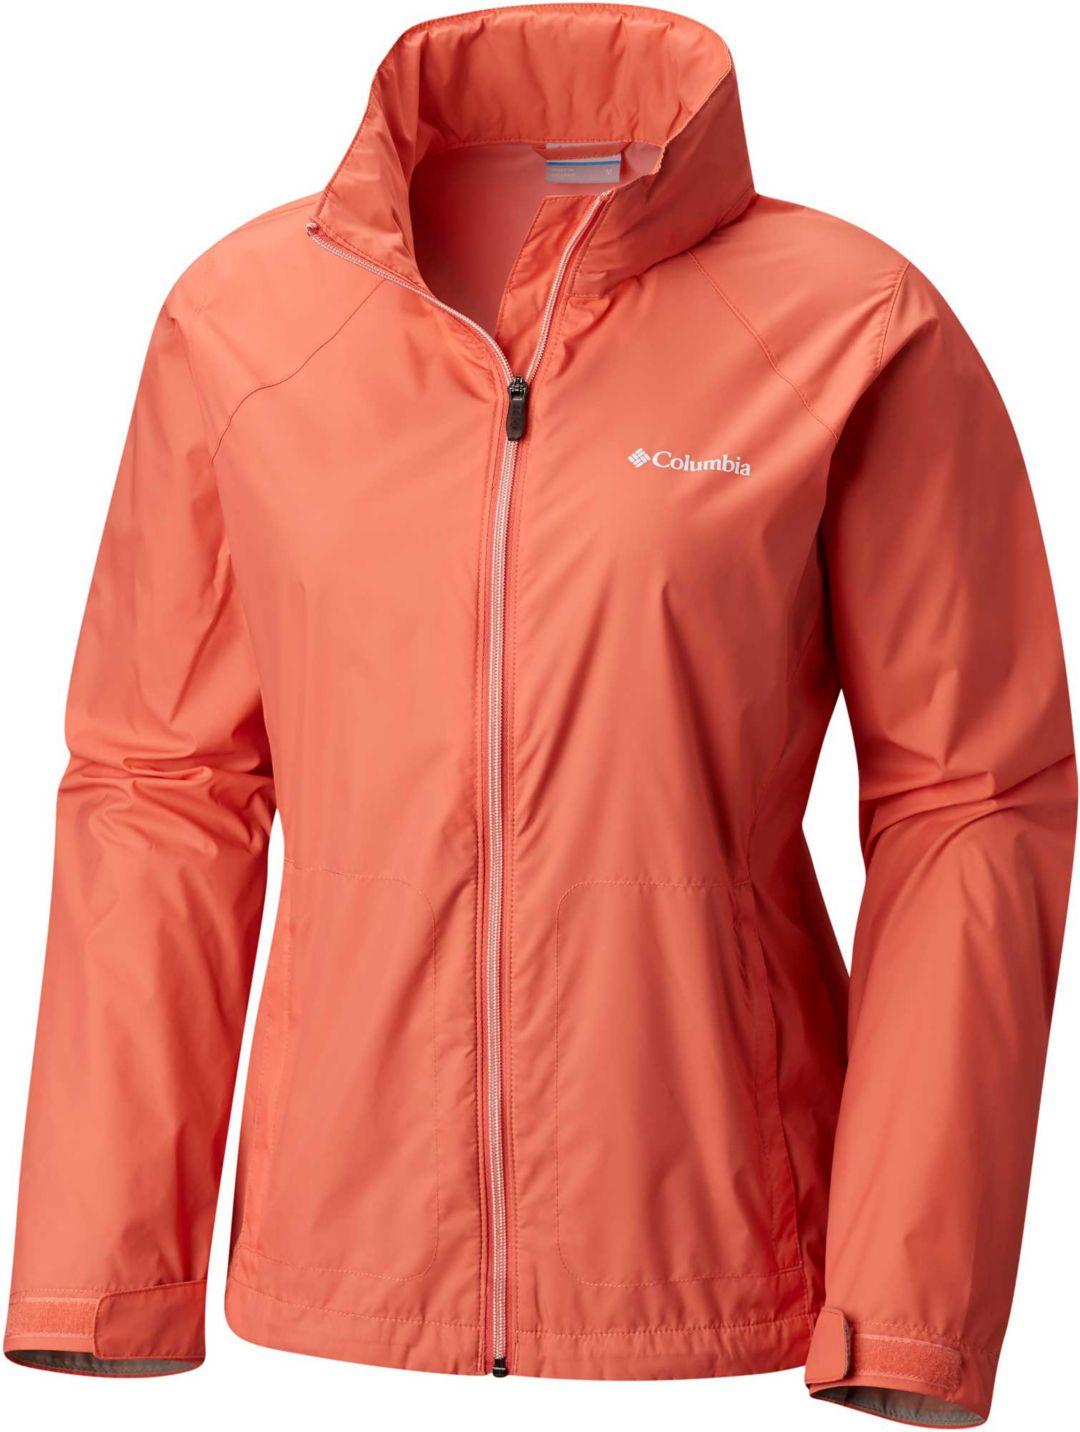 bdabb76b5 Columbia Women's Switchback Rain Jacket | DICK'S Sporting Goods